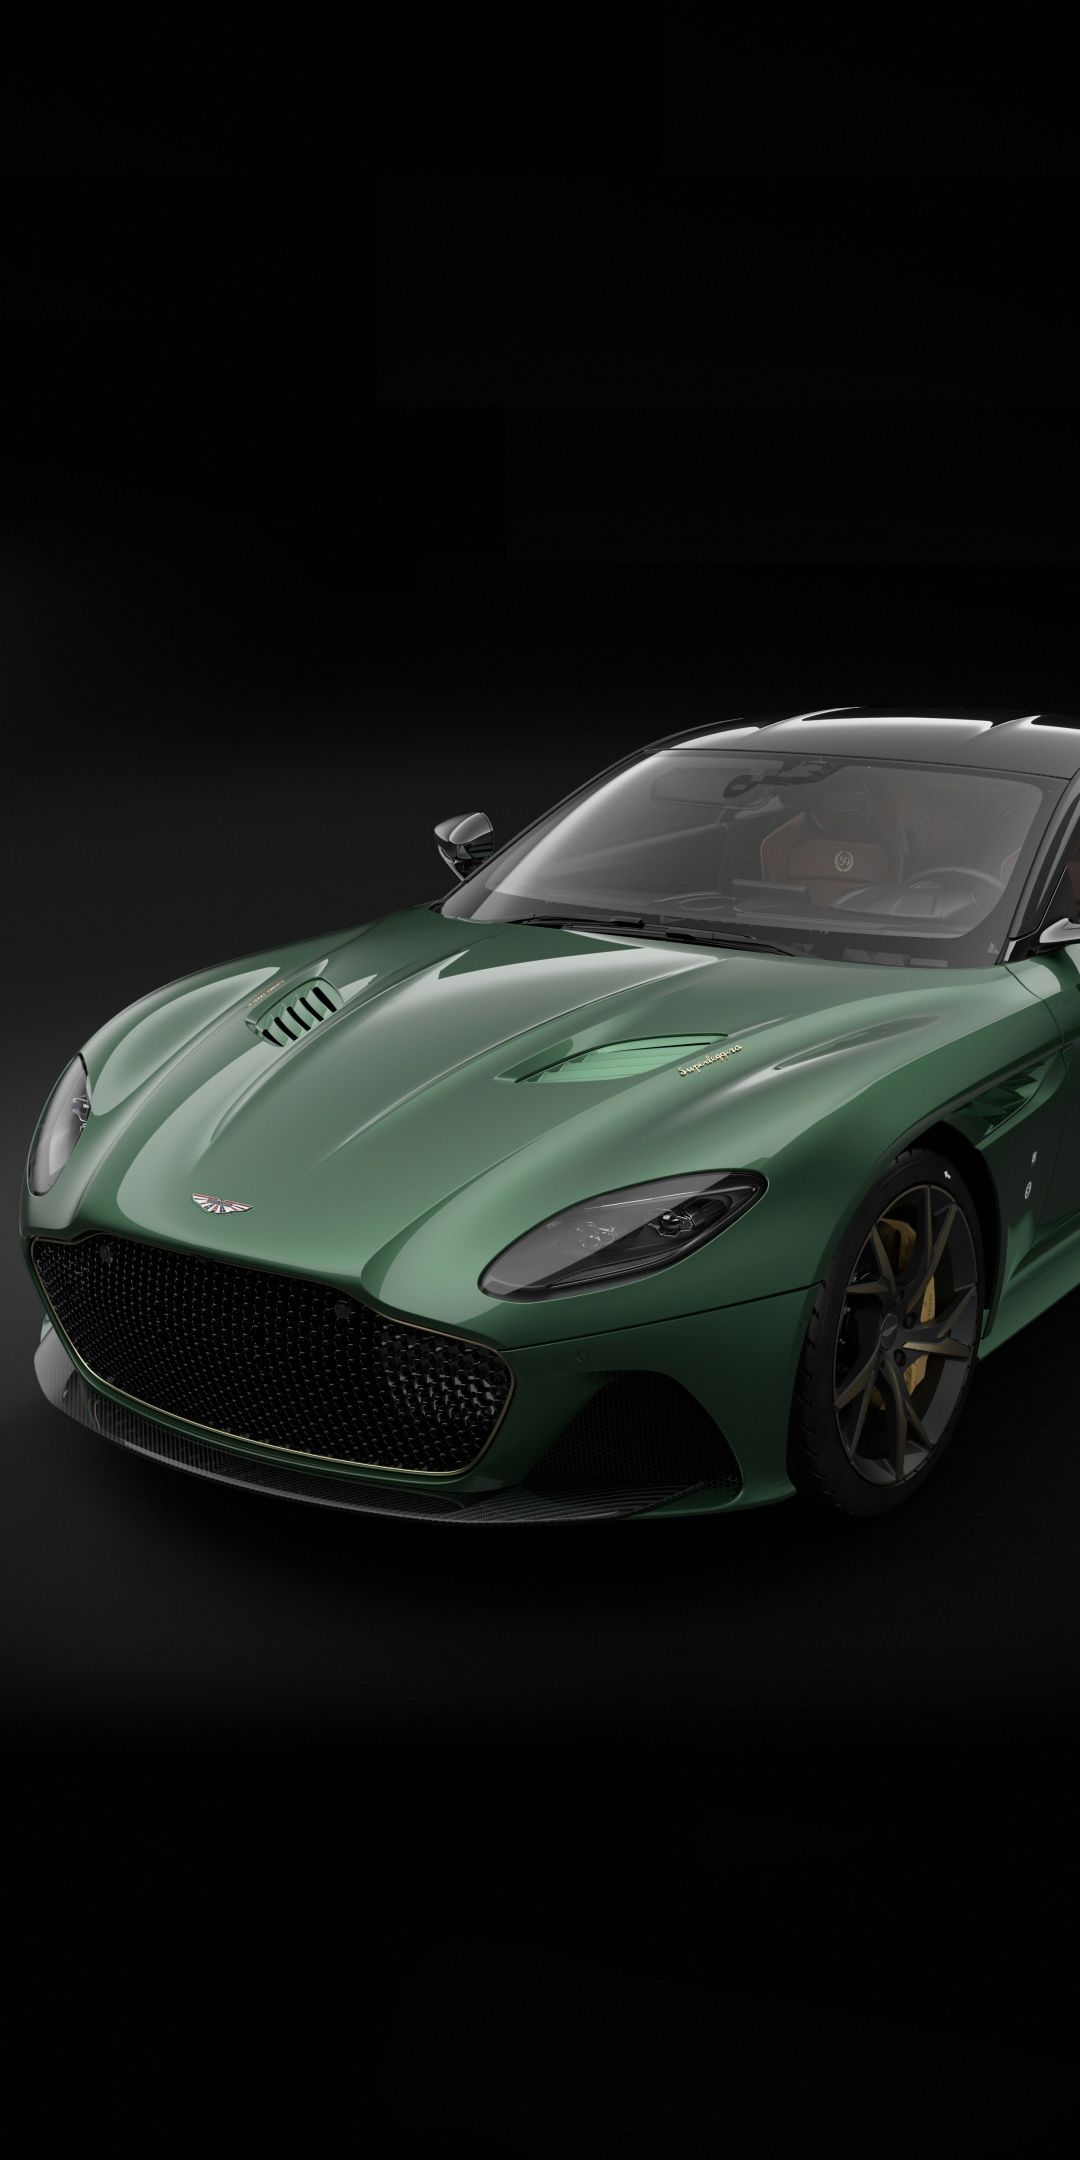 Green Aston Martin Dbs Portrait 1080x2160 Wallpaper Cars